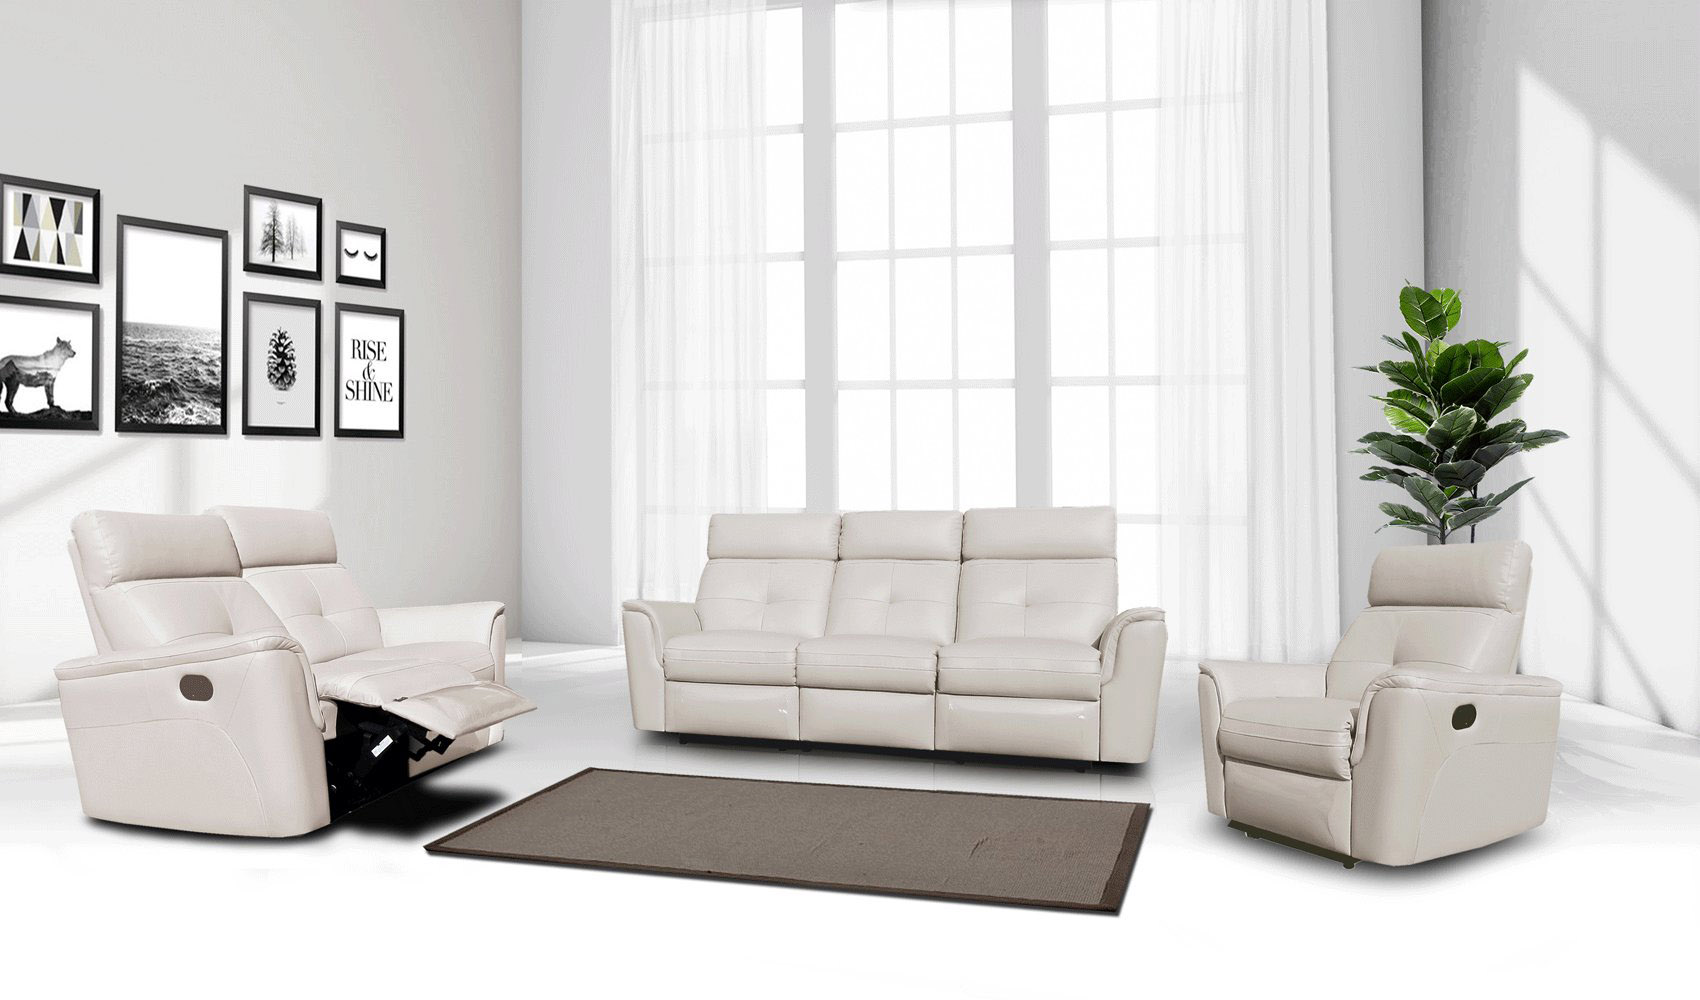 Contemporary Arizona Leather Living Room Set - Palm Beach ...